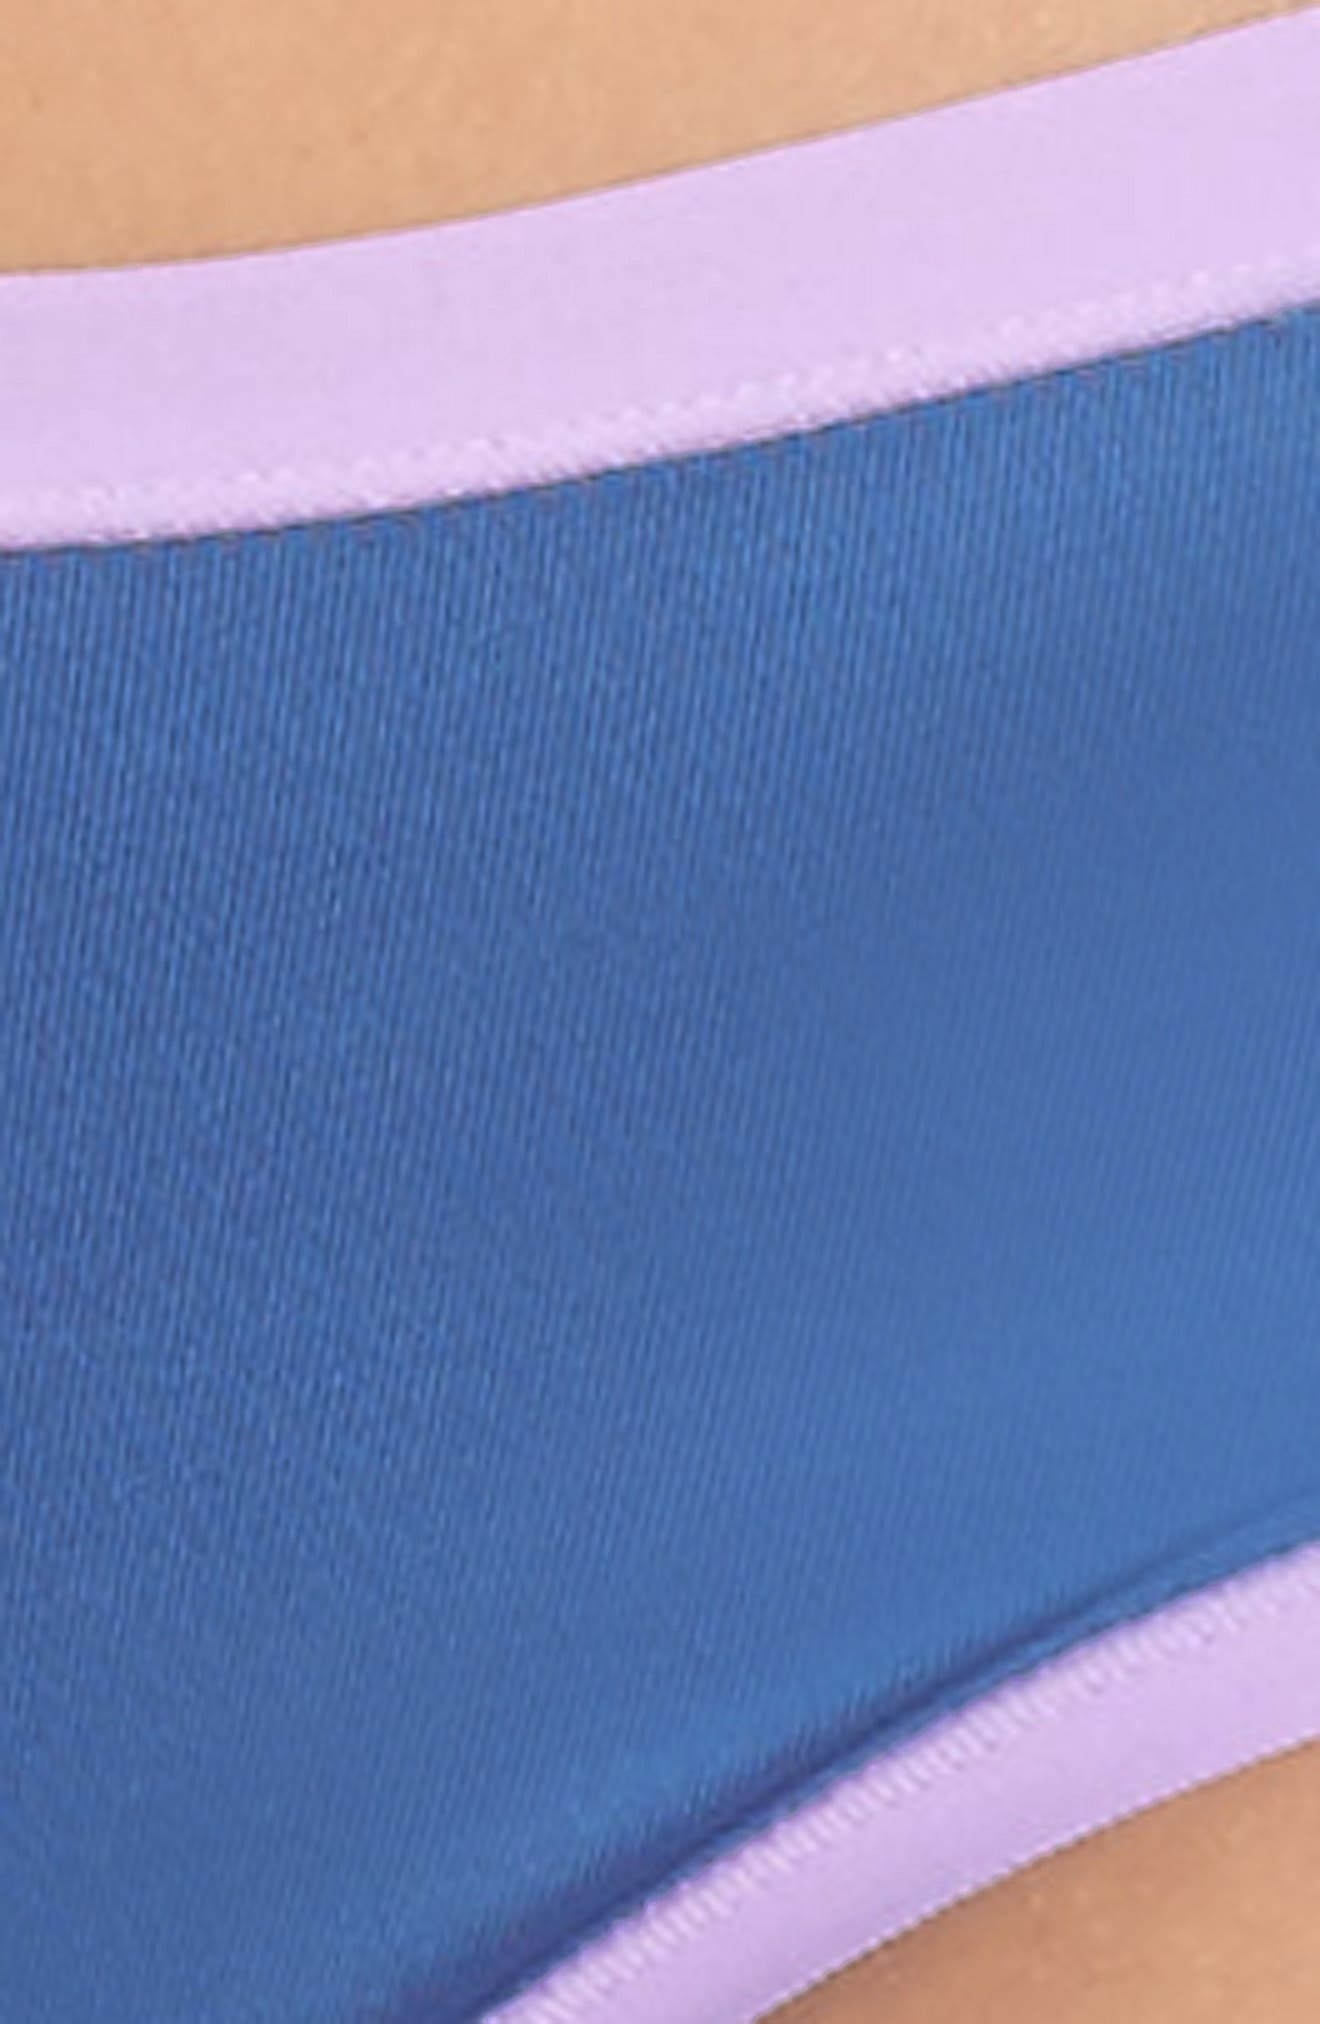 Yogi Girl Briefs,                             Alternate thumbnail 7, color,